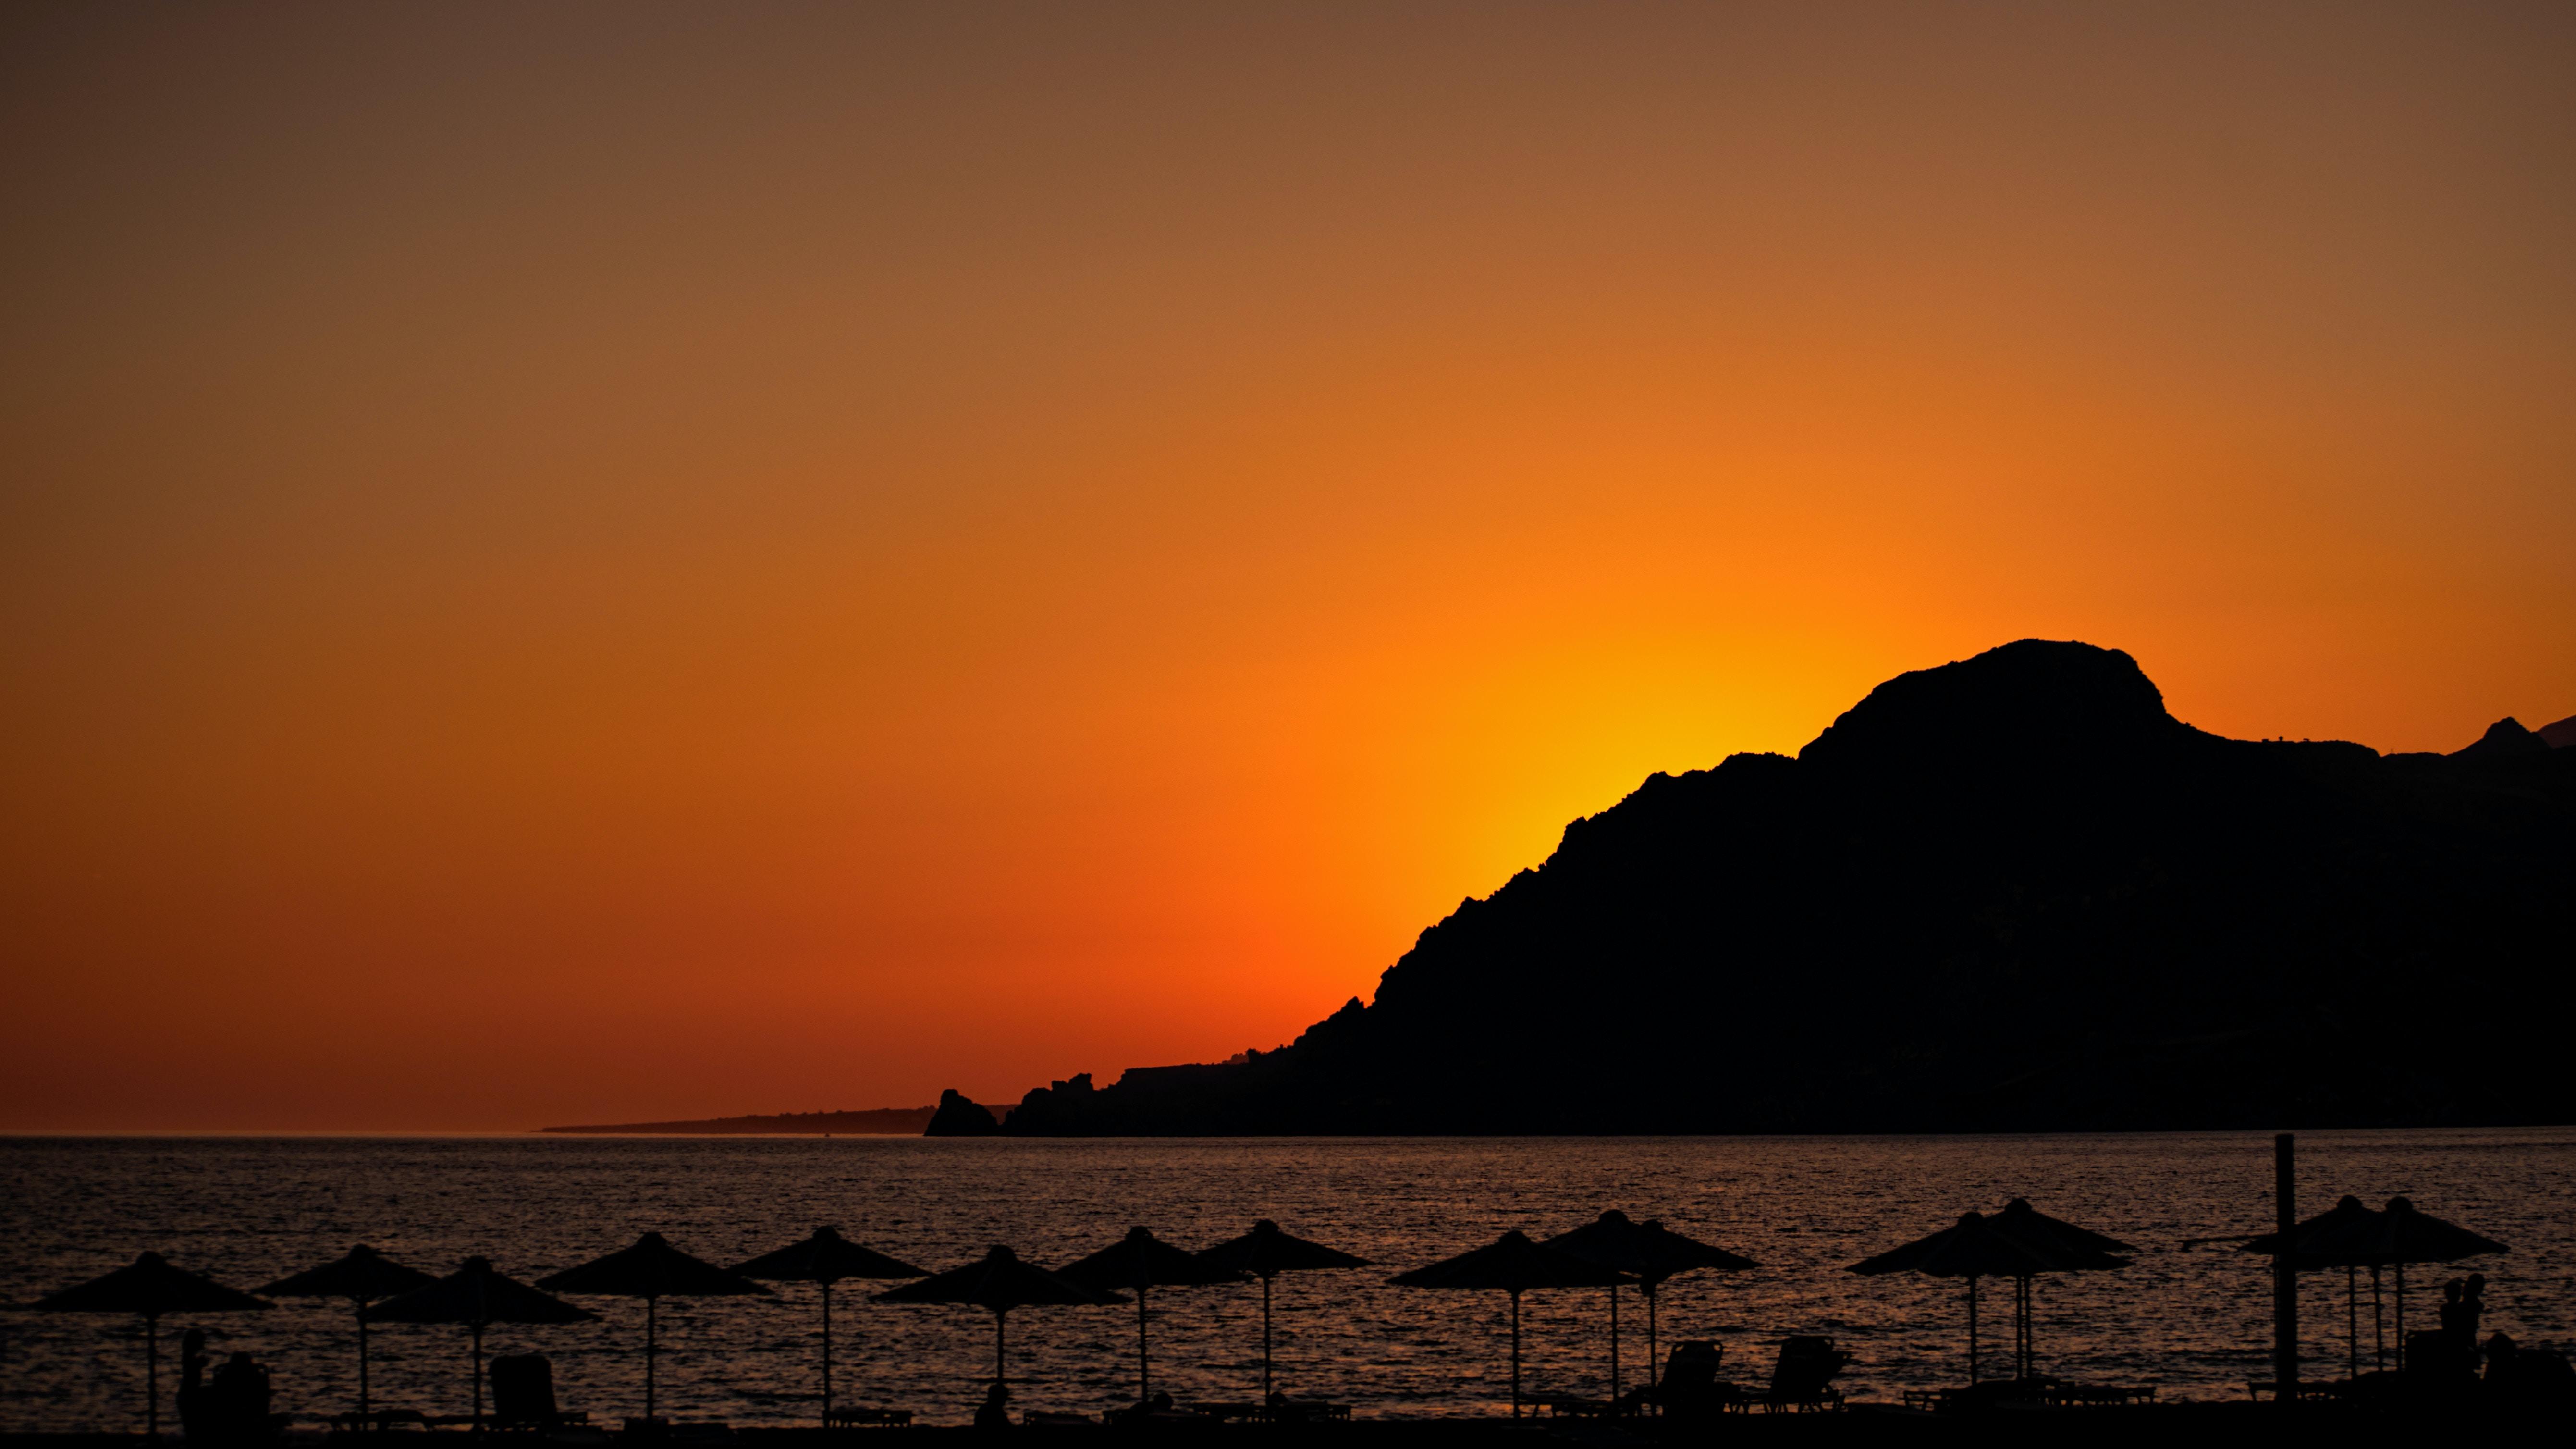 silhouette of mountain during sun set